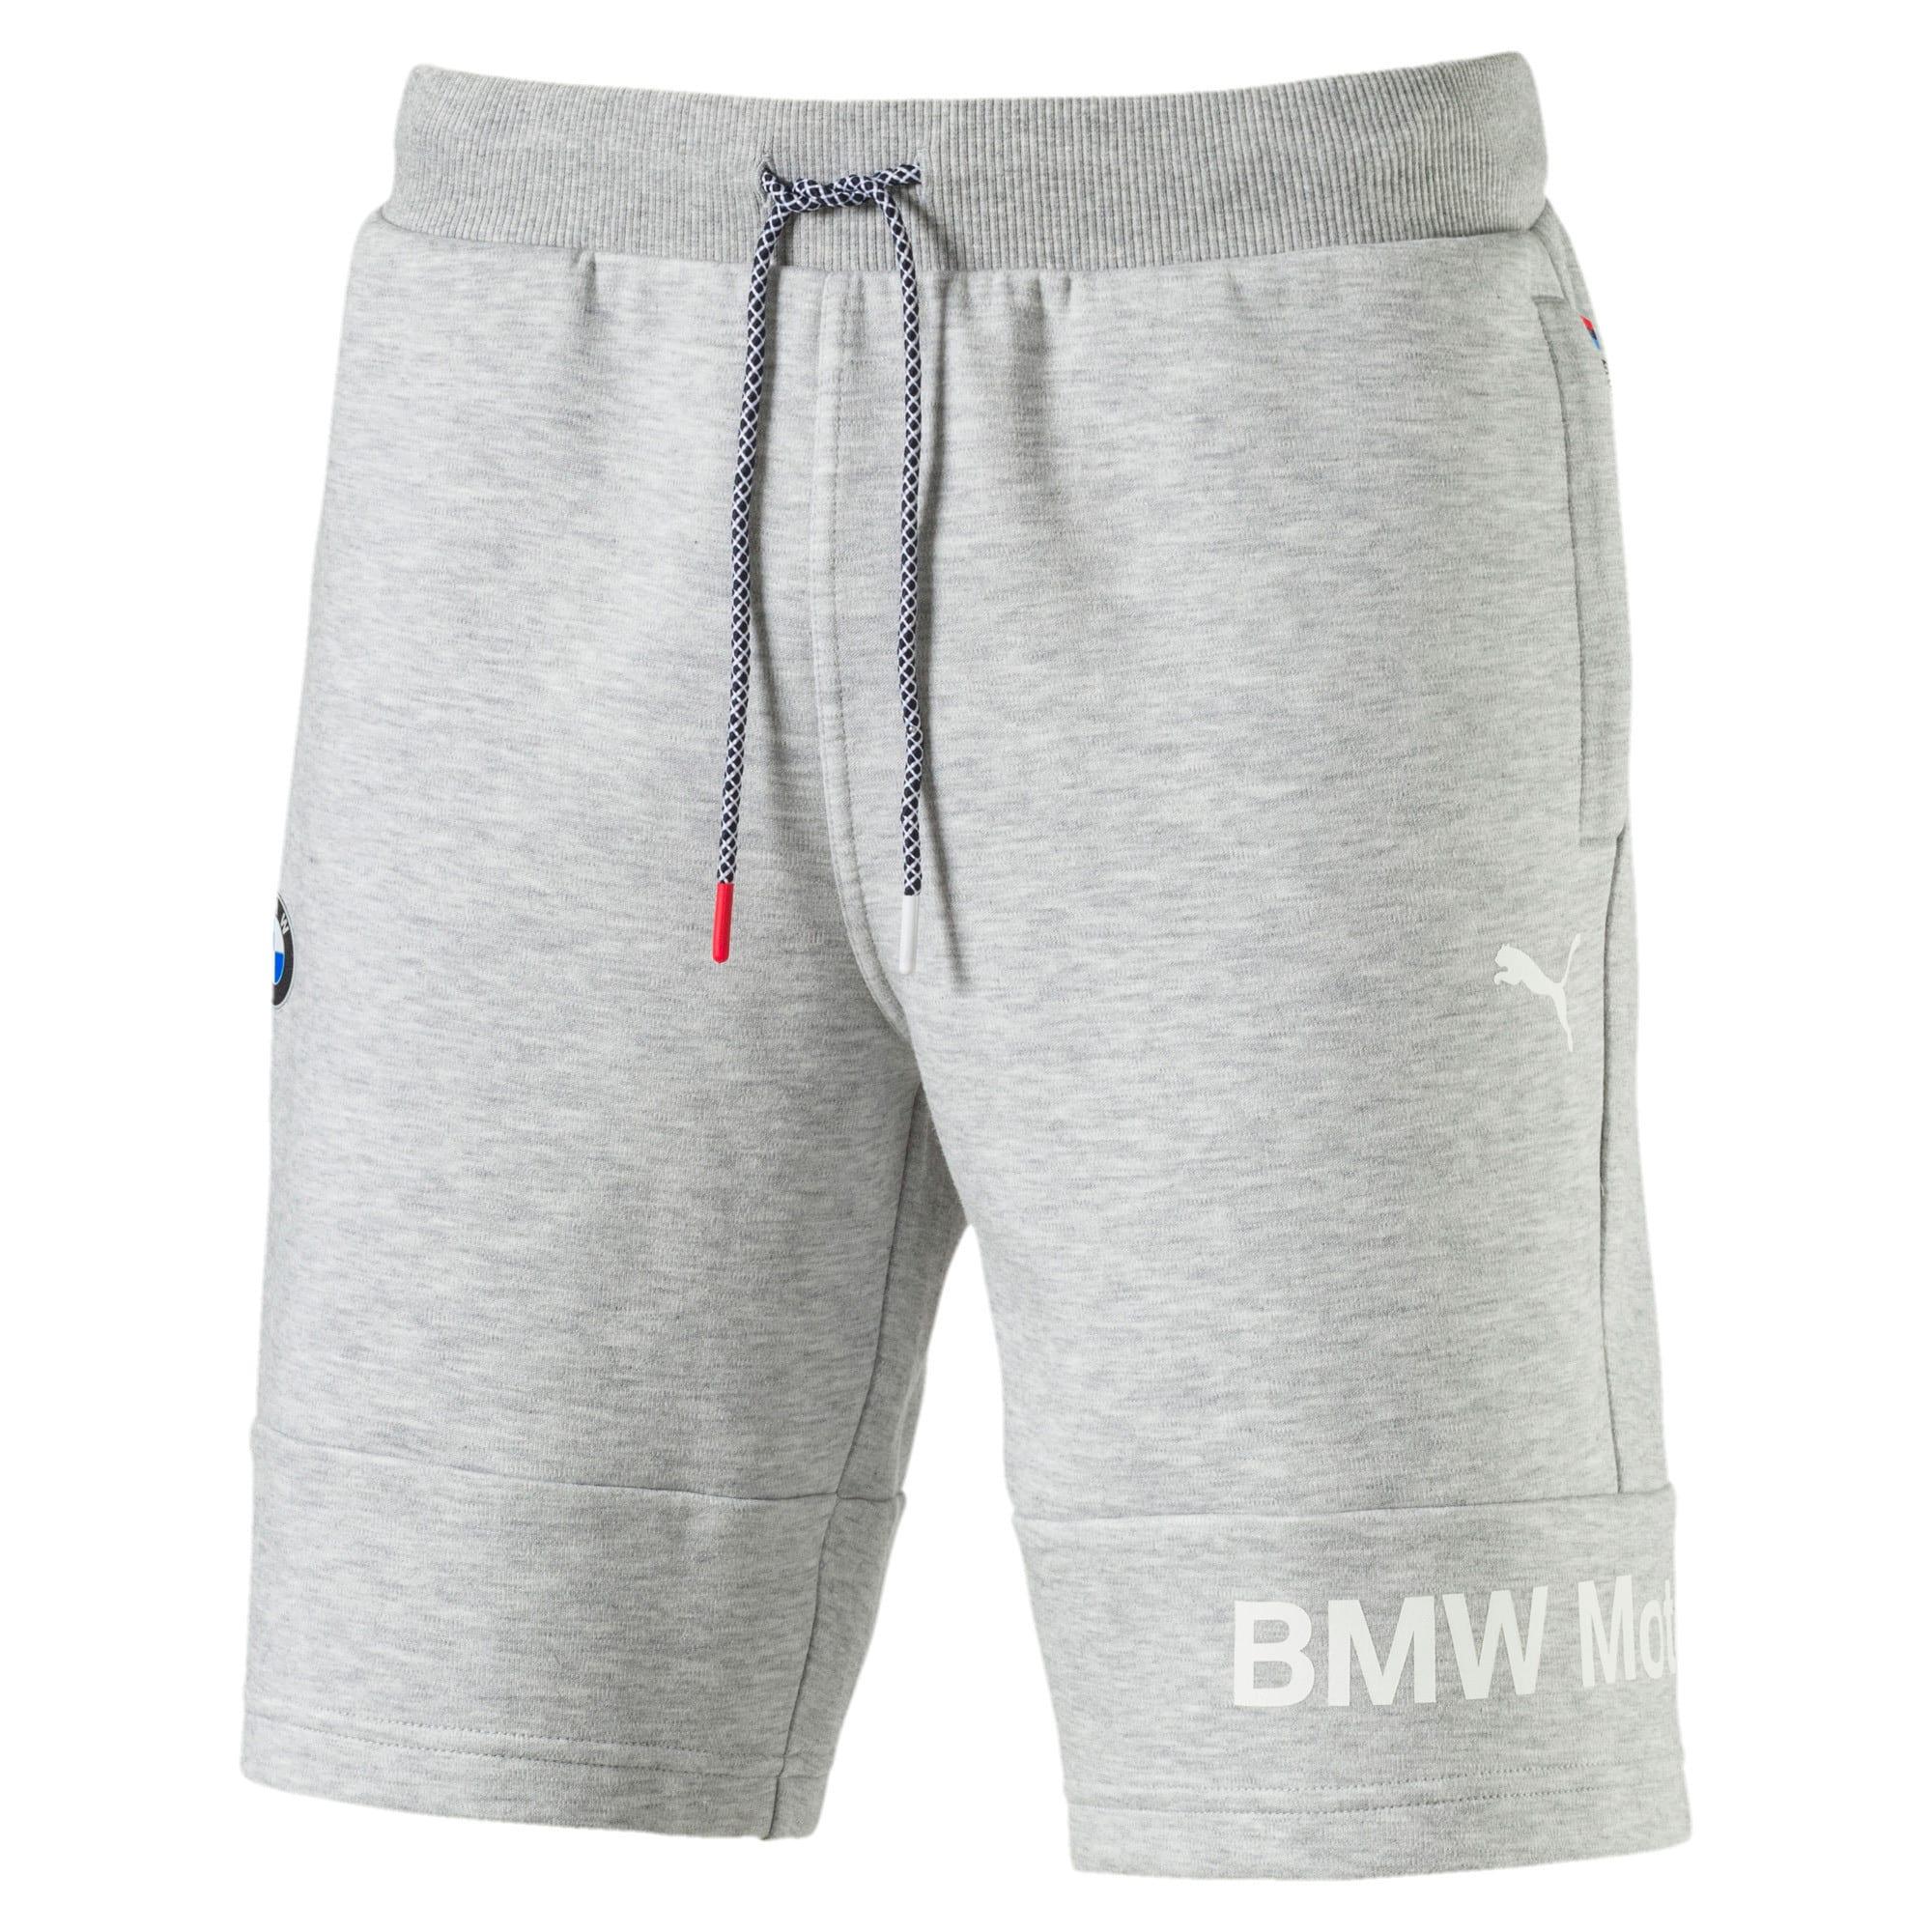 Thumbnail 2 of BMW Motorsport Men's Sweat Shorts, Light Gray Heather, medium-IND